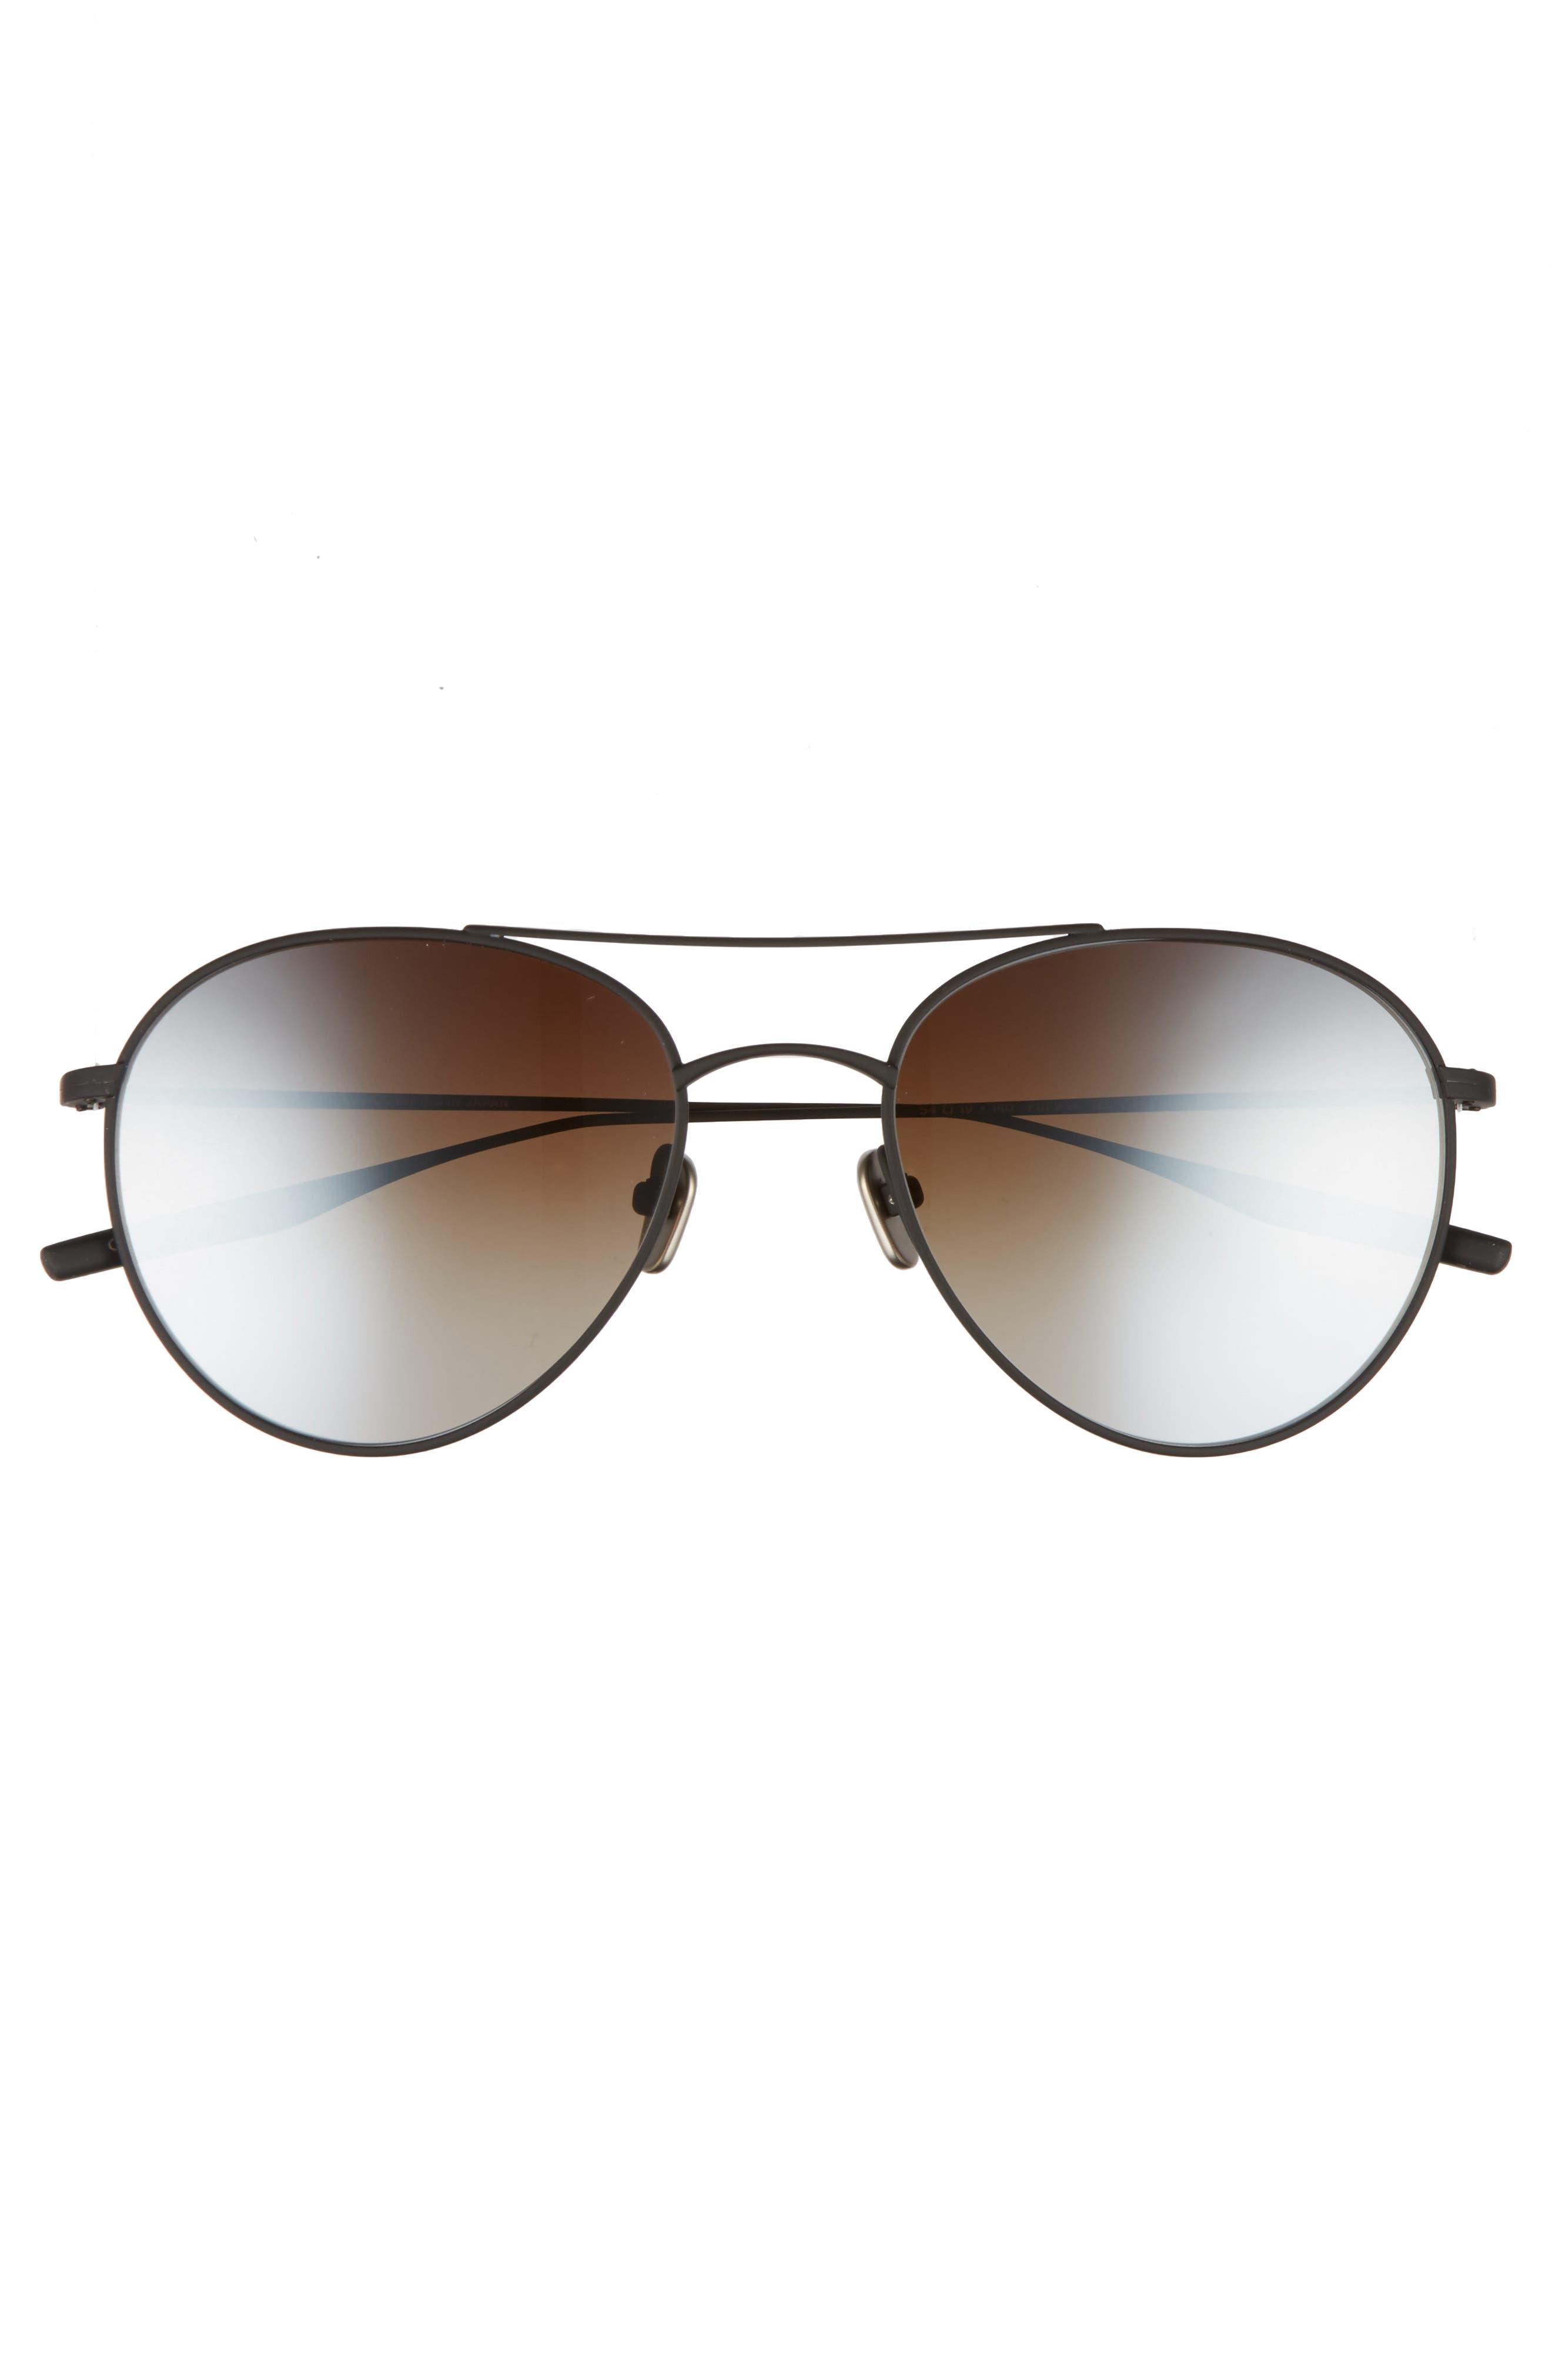 Fufkin 54mm Polarized Round Sunglasses,                             Alternate thumbnail 3, color,                             Black Sand